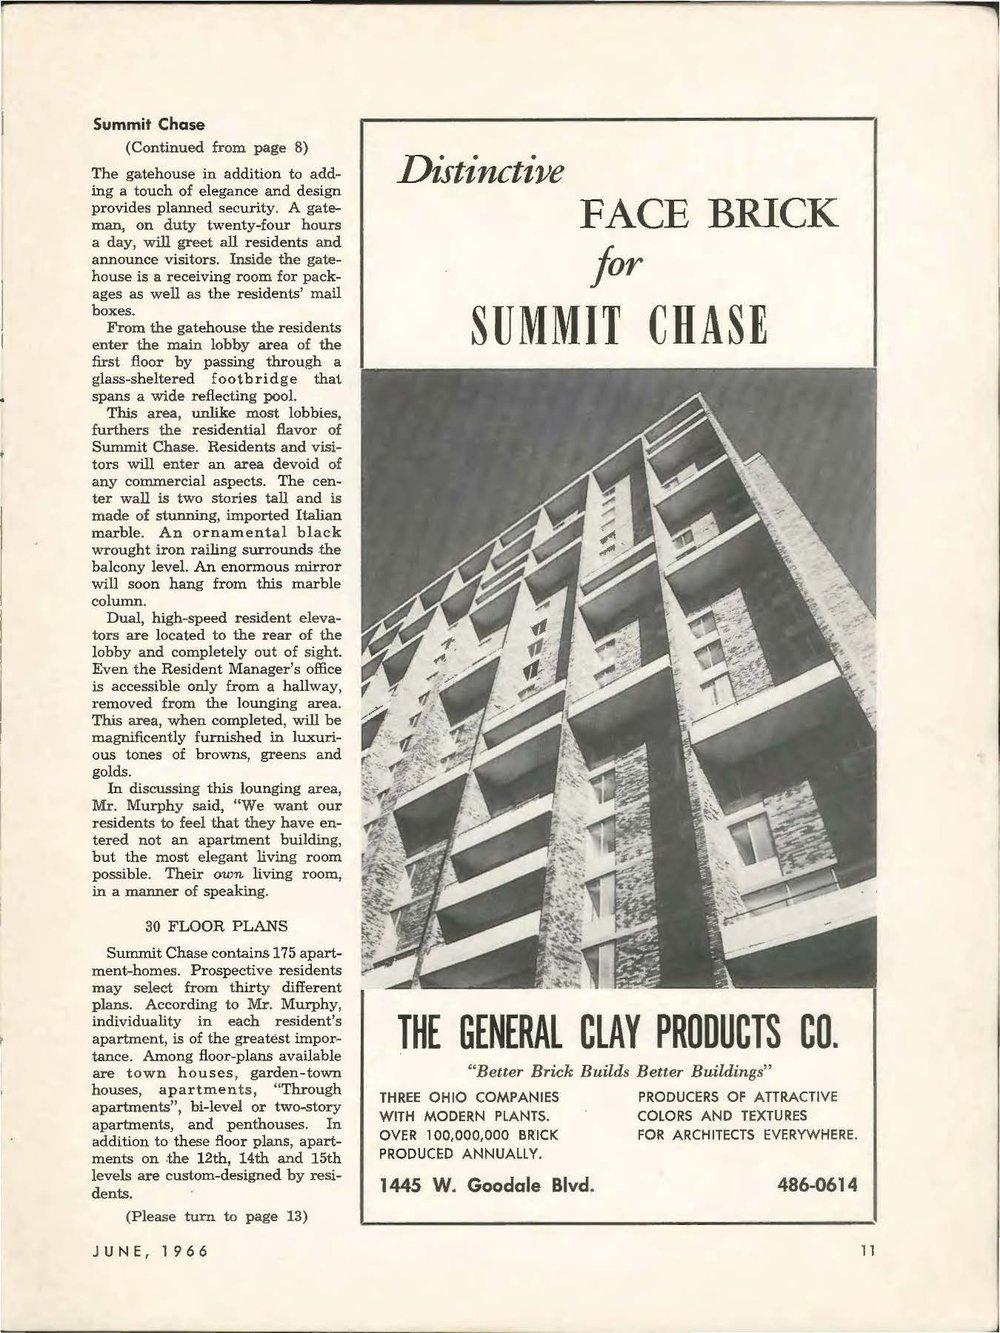 Skyline 1966_Page_11.jpg